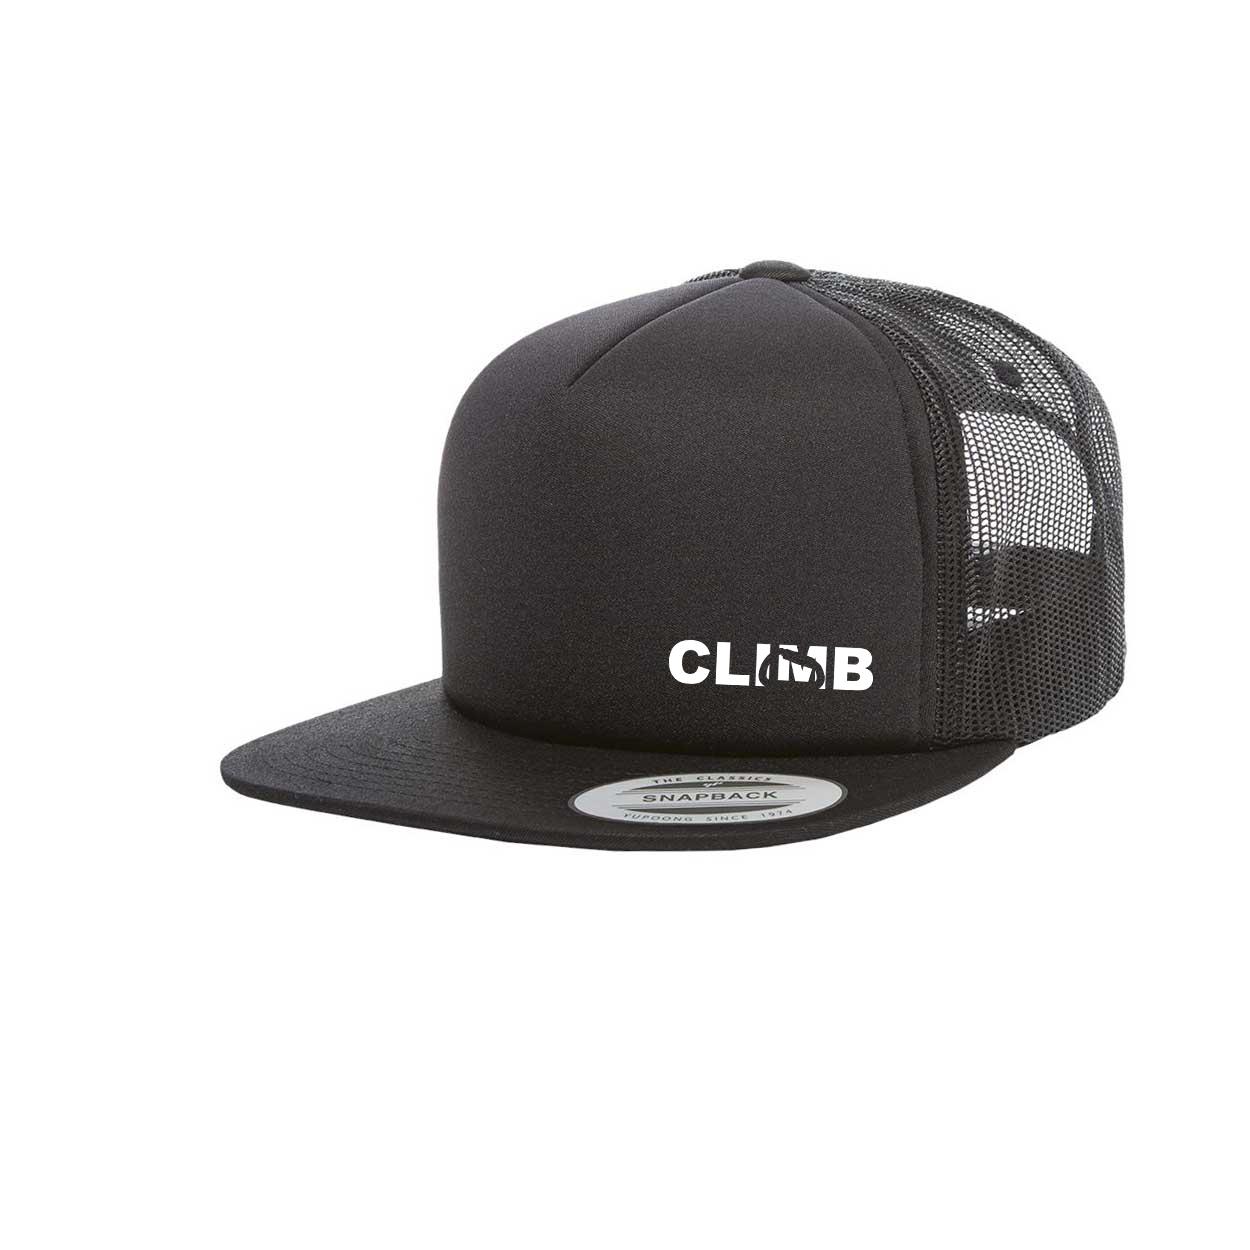 Climb Carabiner Logo Night Out Premium Foam Flat Brim Snapback Hat Black (White Logo)